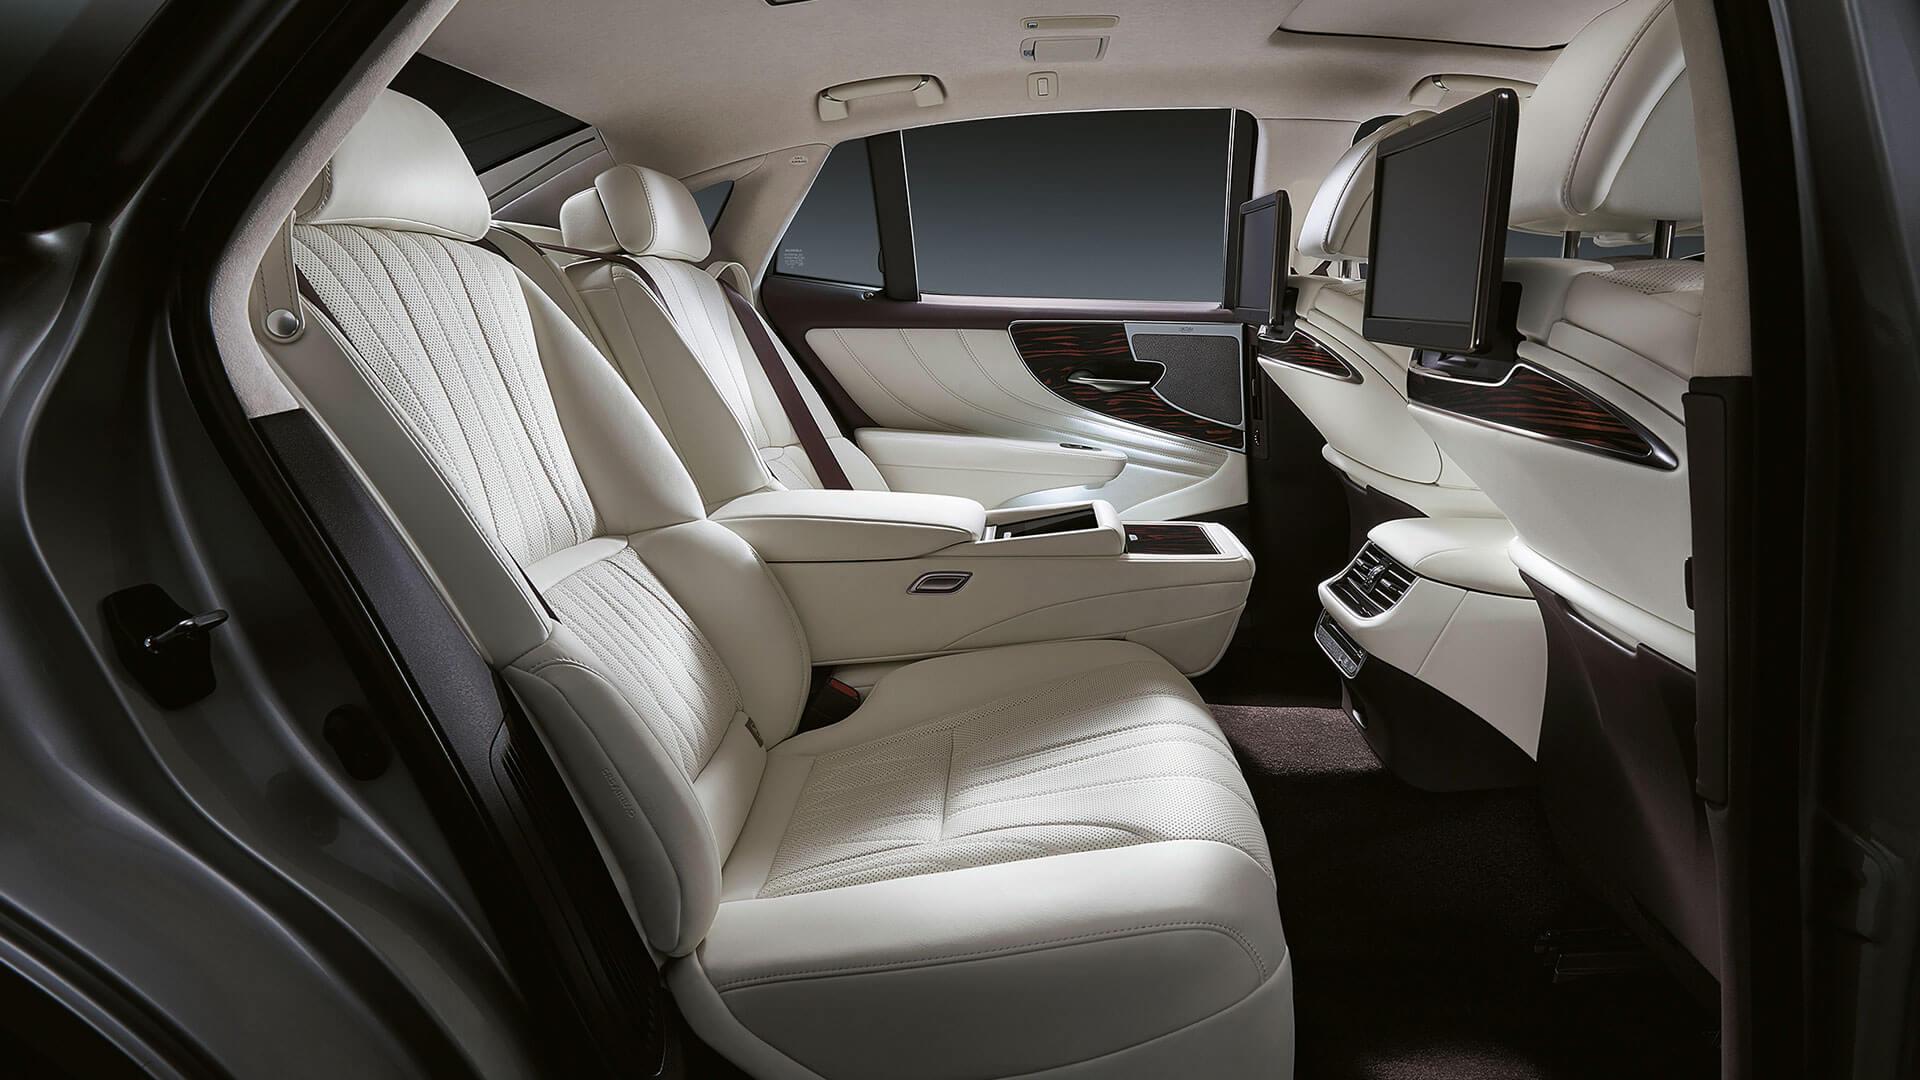 2018 lexus ls features leather seats